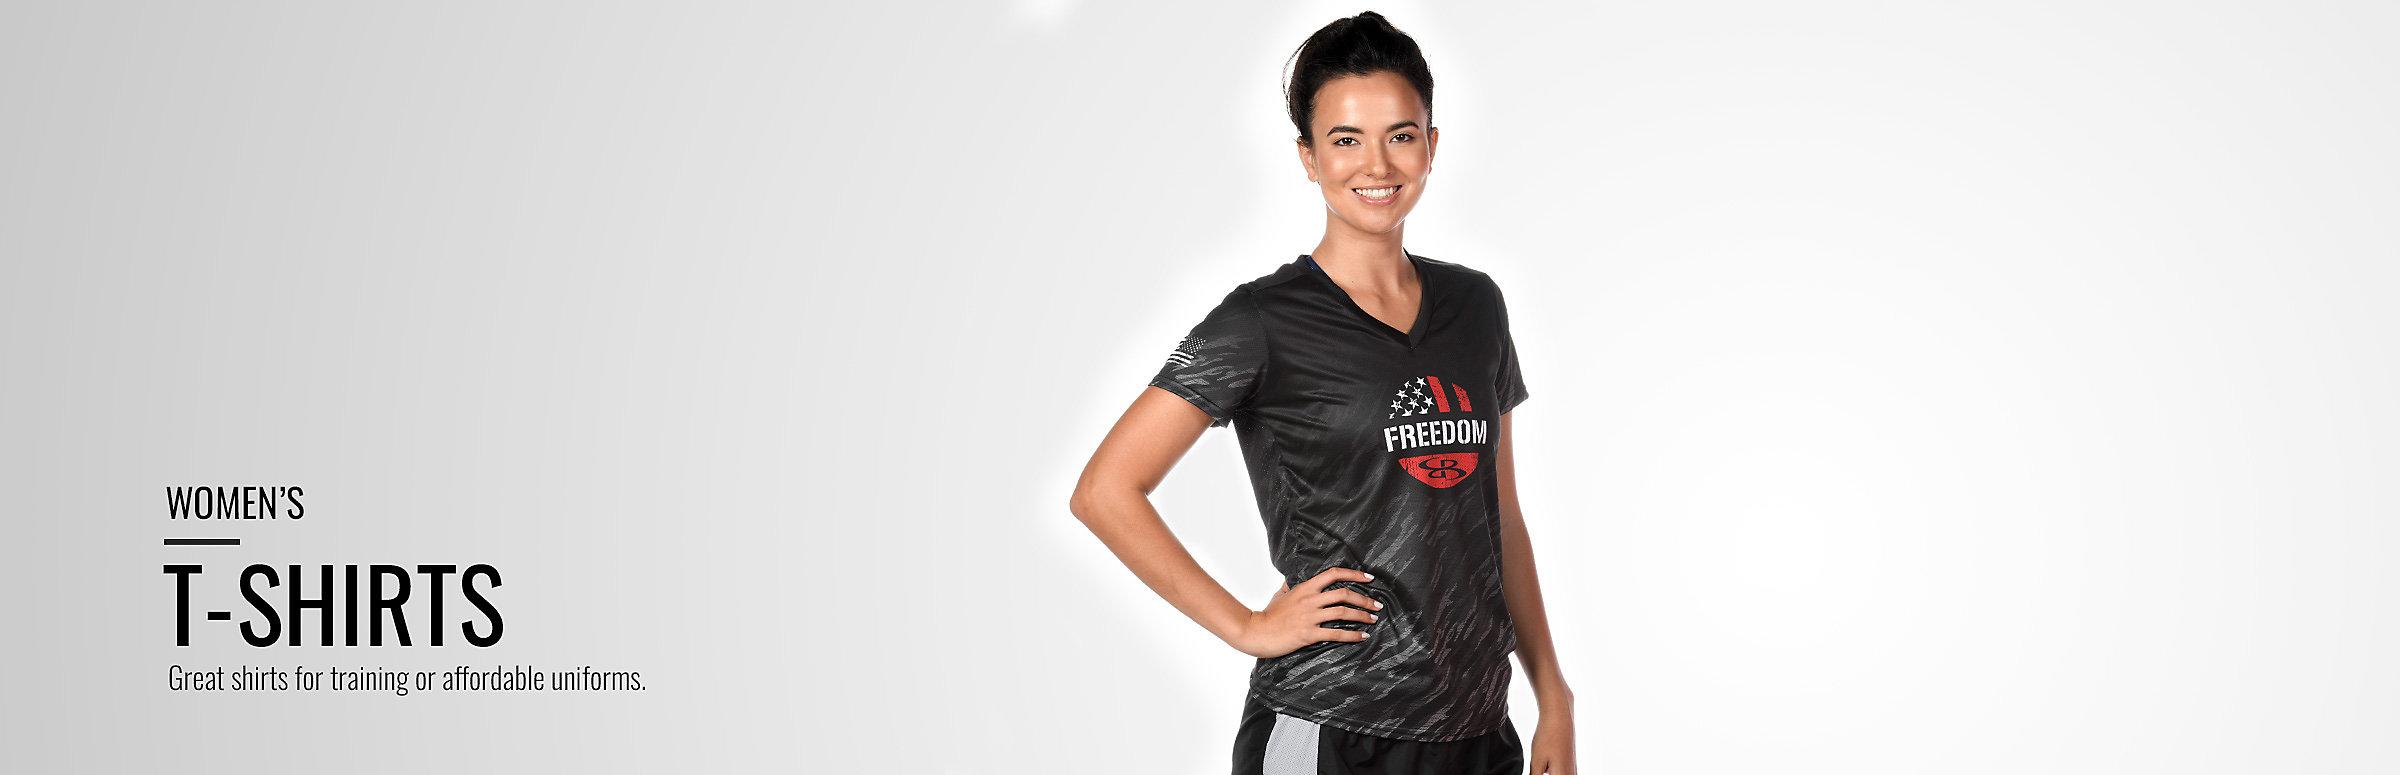 Women's Performance Shirts